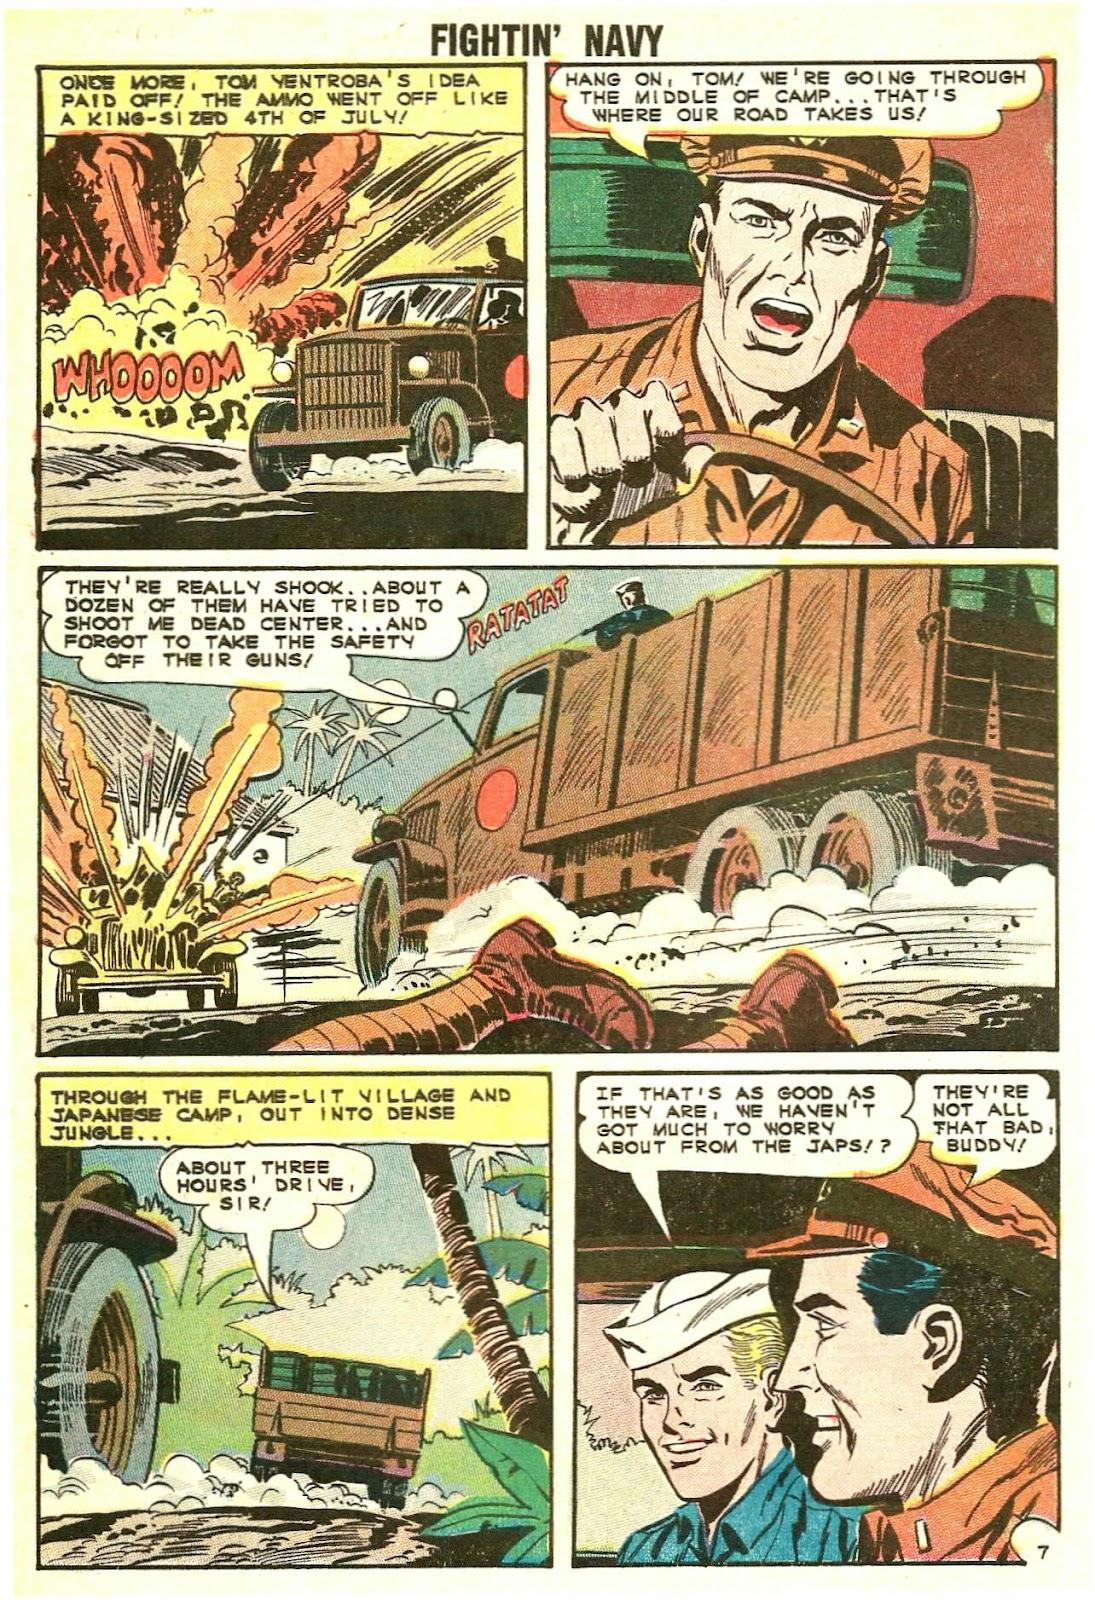 Read online Fightin' Navy comic -  Issue #117 - 10